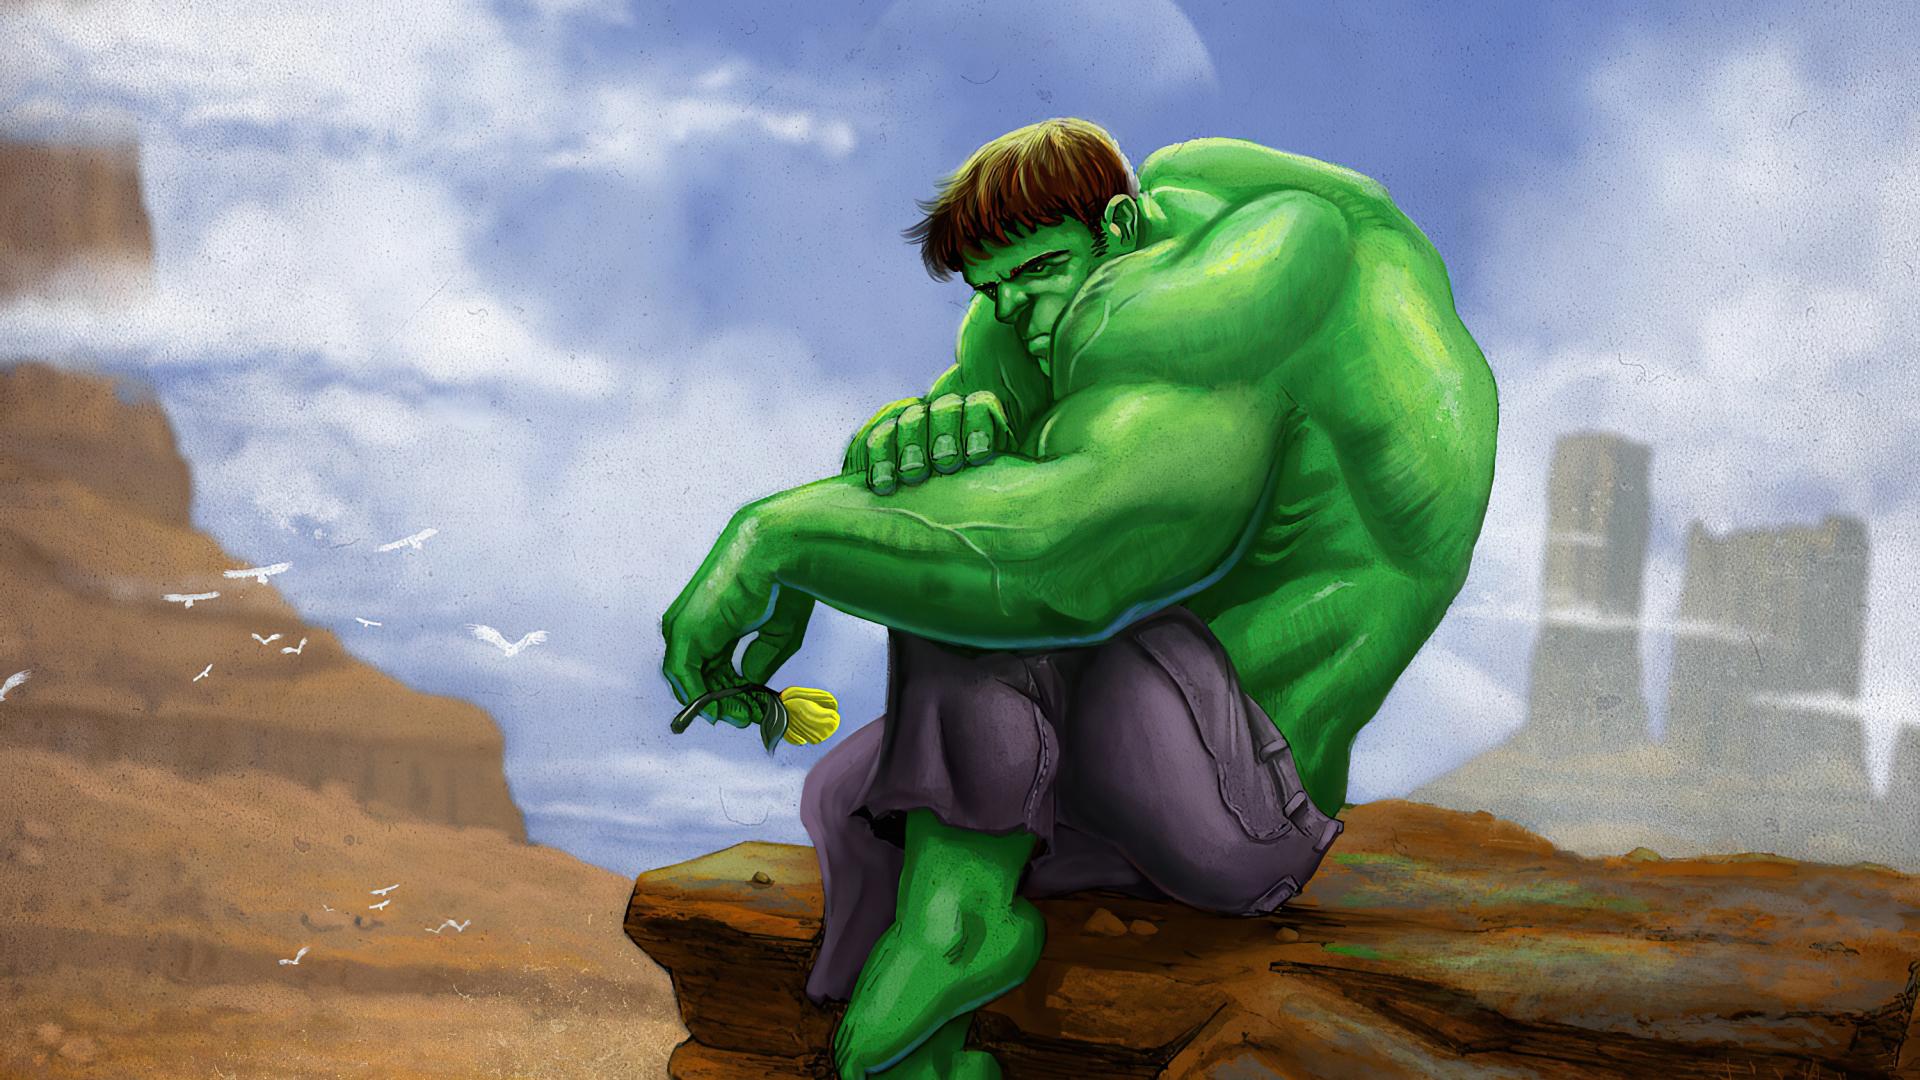 1920x1080 Sad Hulk Marvel Comic 1080p Laptop Full Hd Wallpaper Hd Superheroes 4k Wallpapers Images Photos And Background